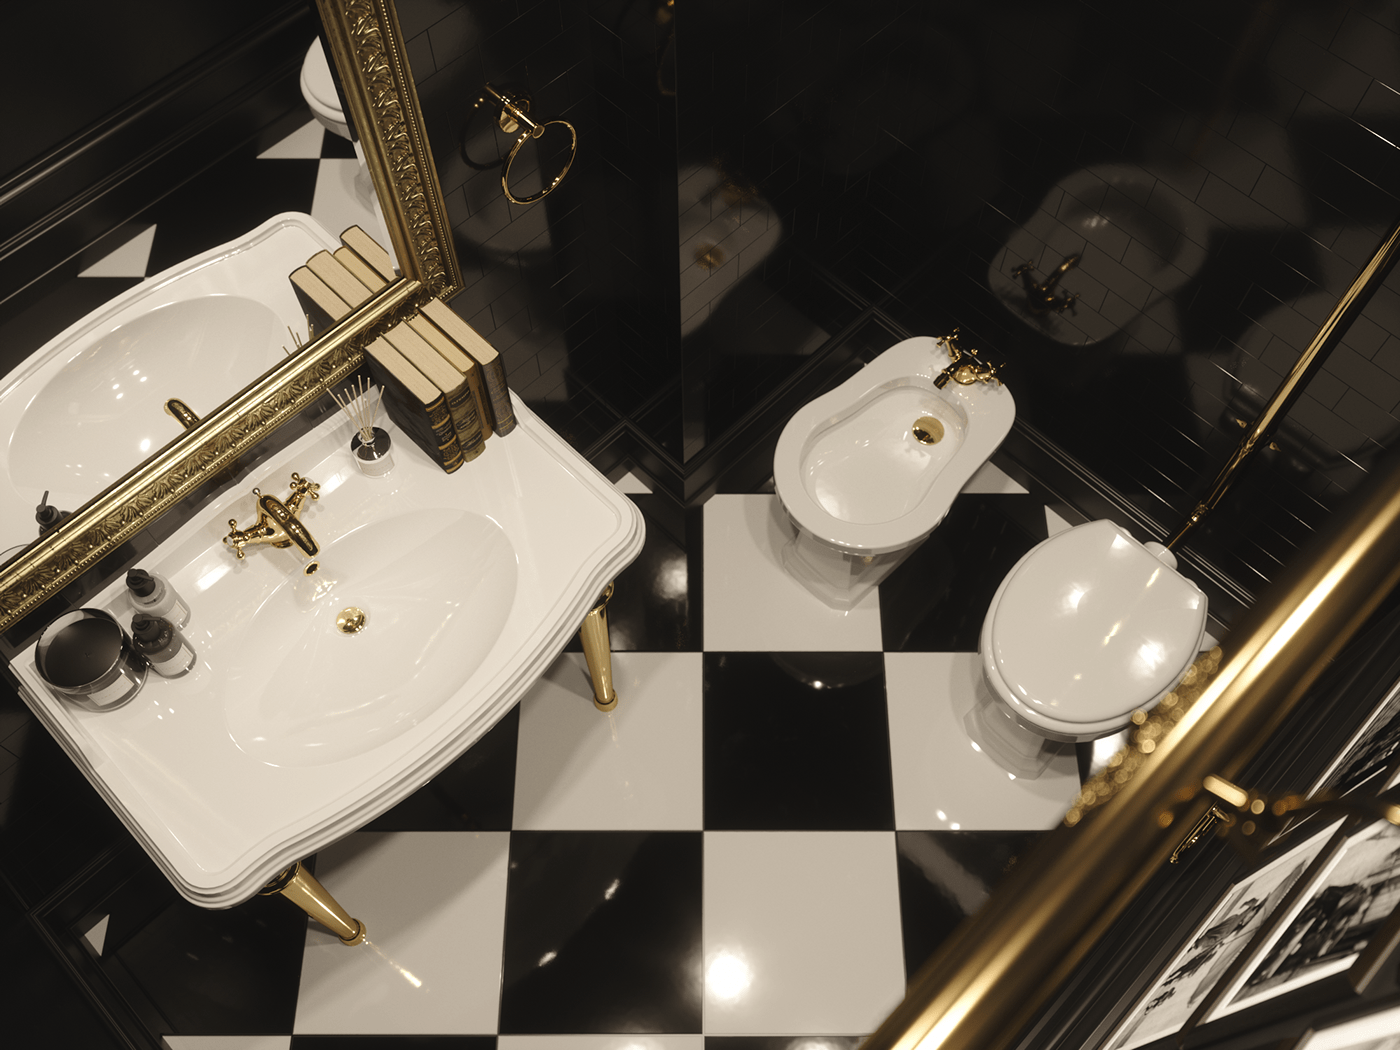 3ds max black tile FStorm gentlemans room gold faucet interior design  toilet